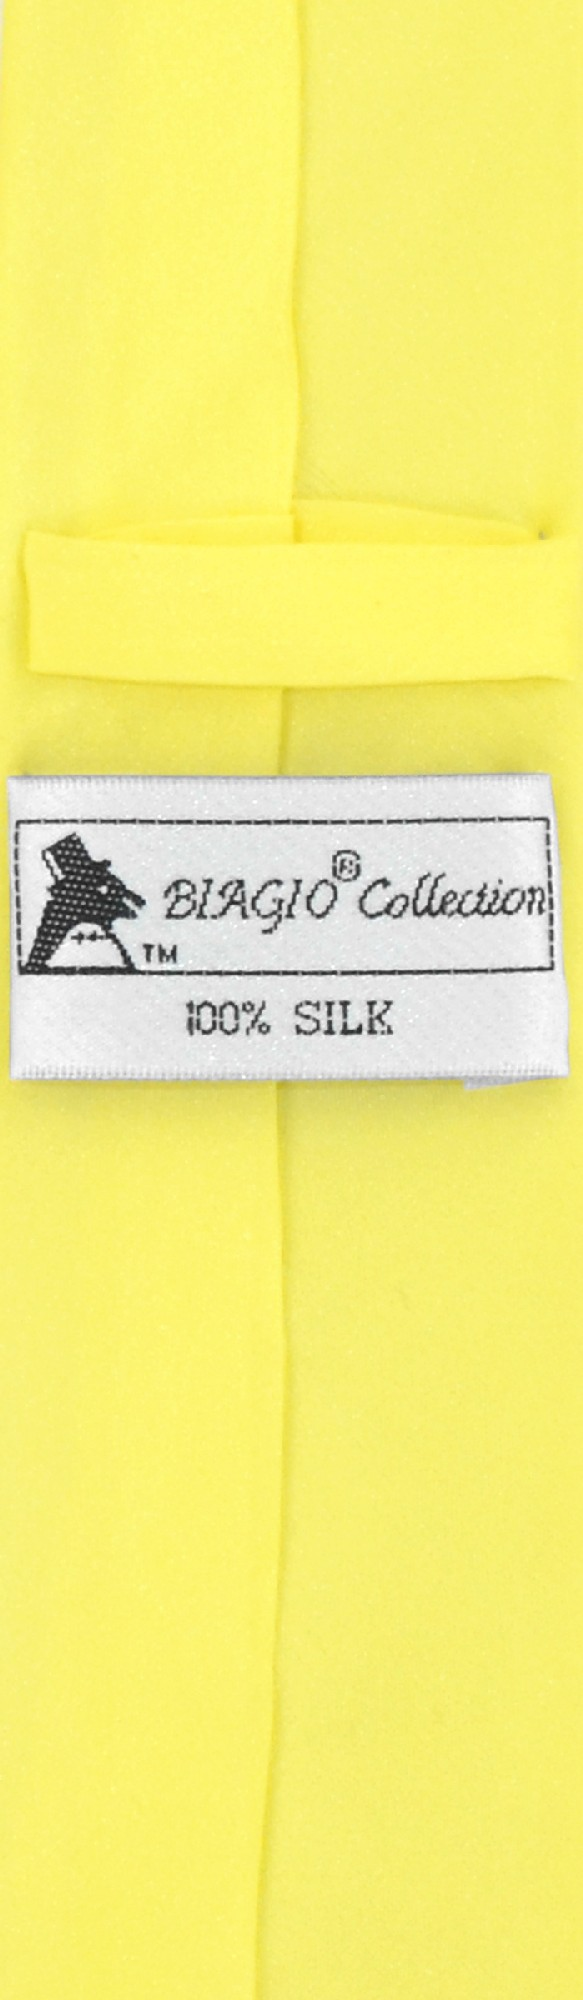 Yellow Skinny Tie And Handkerchief Set | Silk Tie And Hanky Set